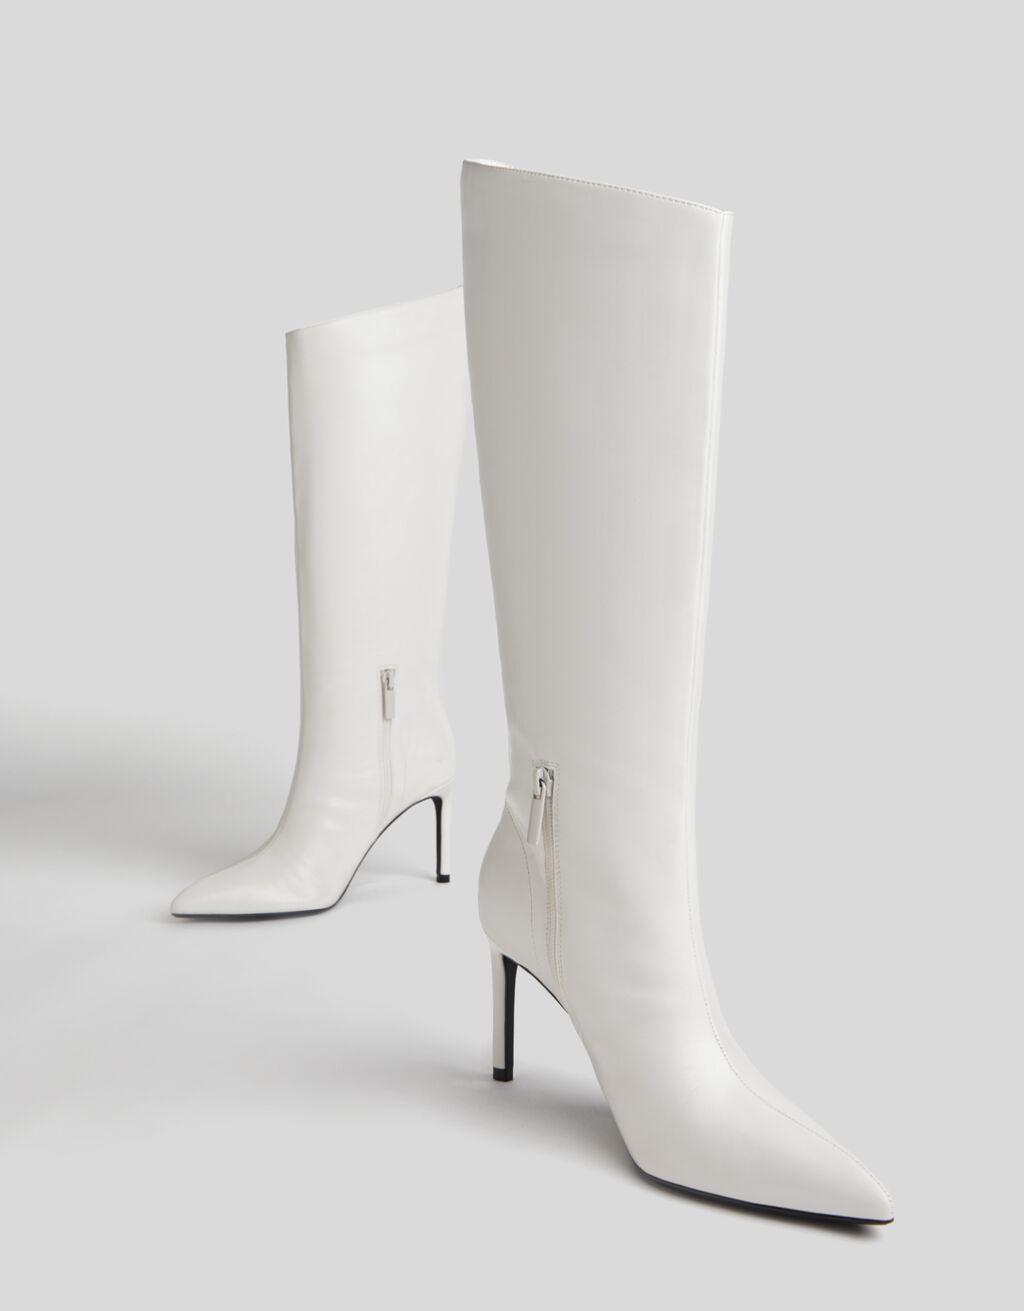 Botas de tacón fino y caña ancha asimétrica